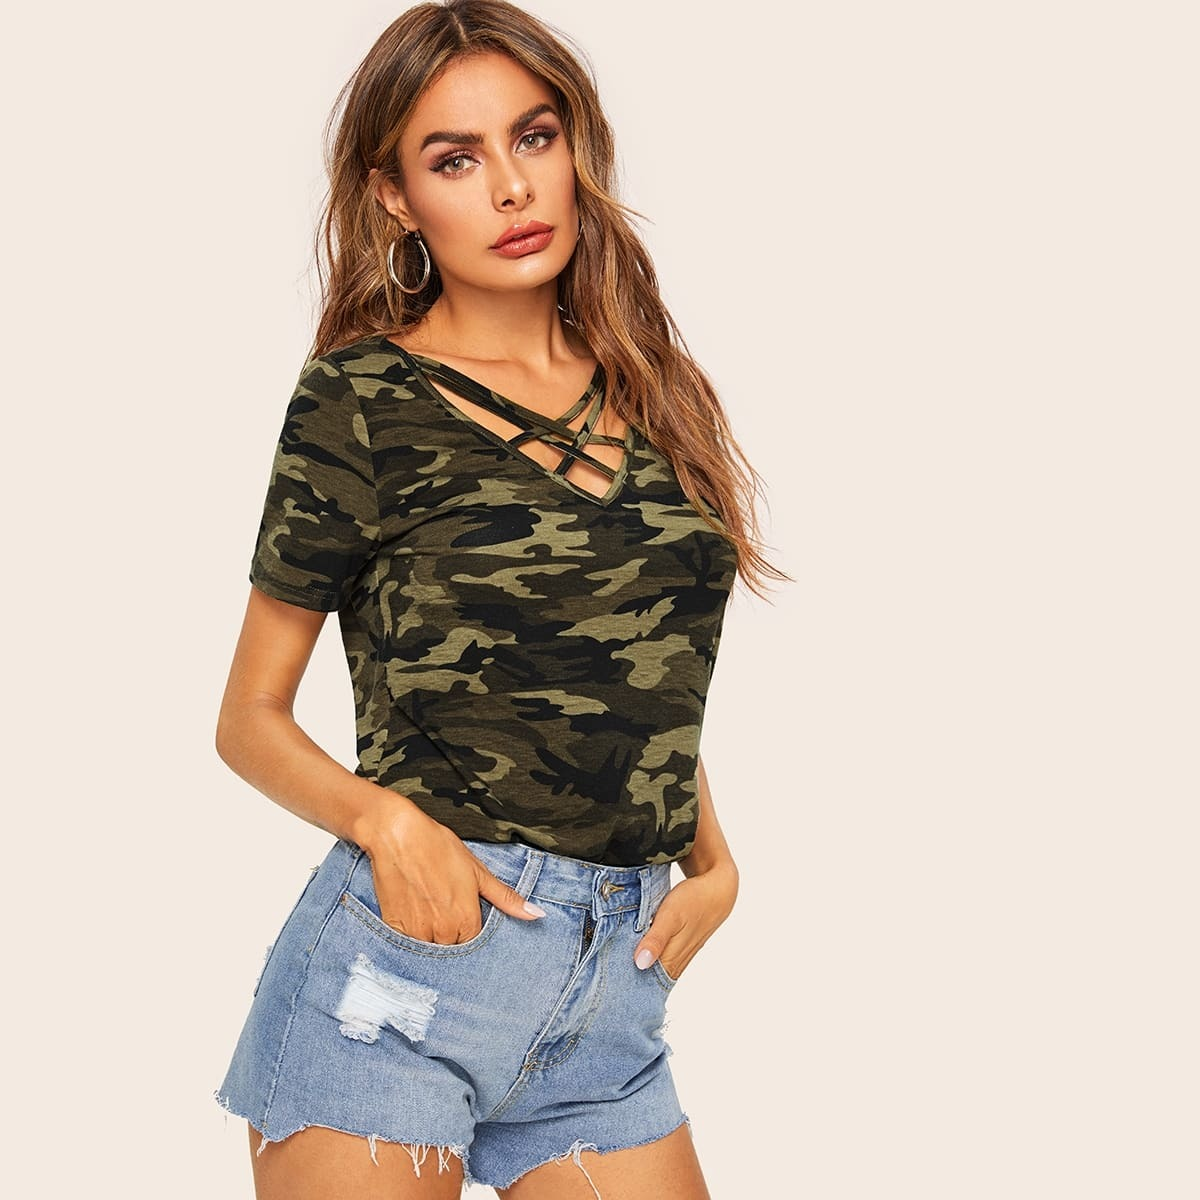 Veel kleurig Casual Camouflage T-shirts criss cross